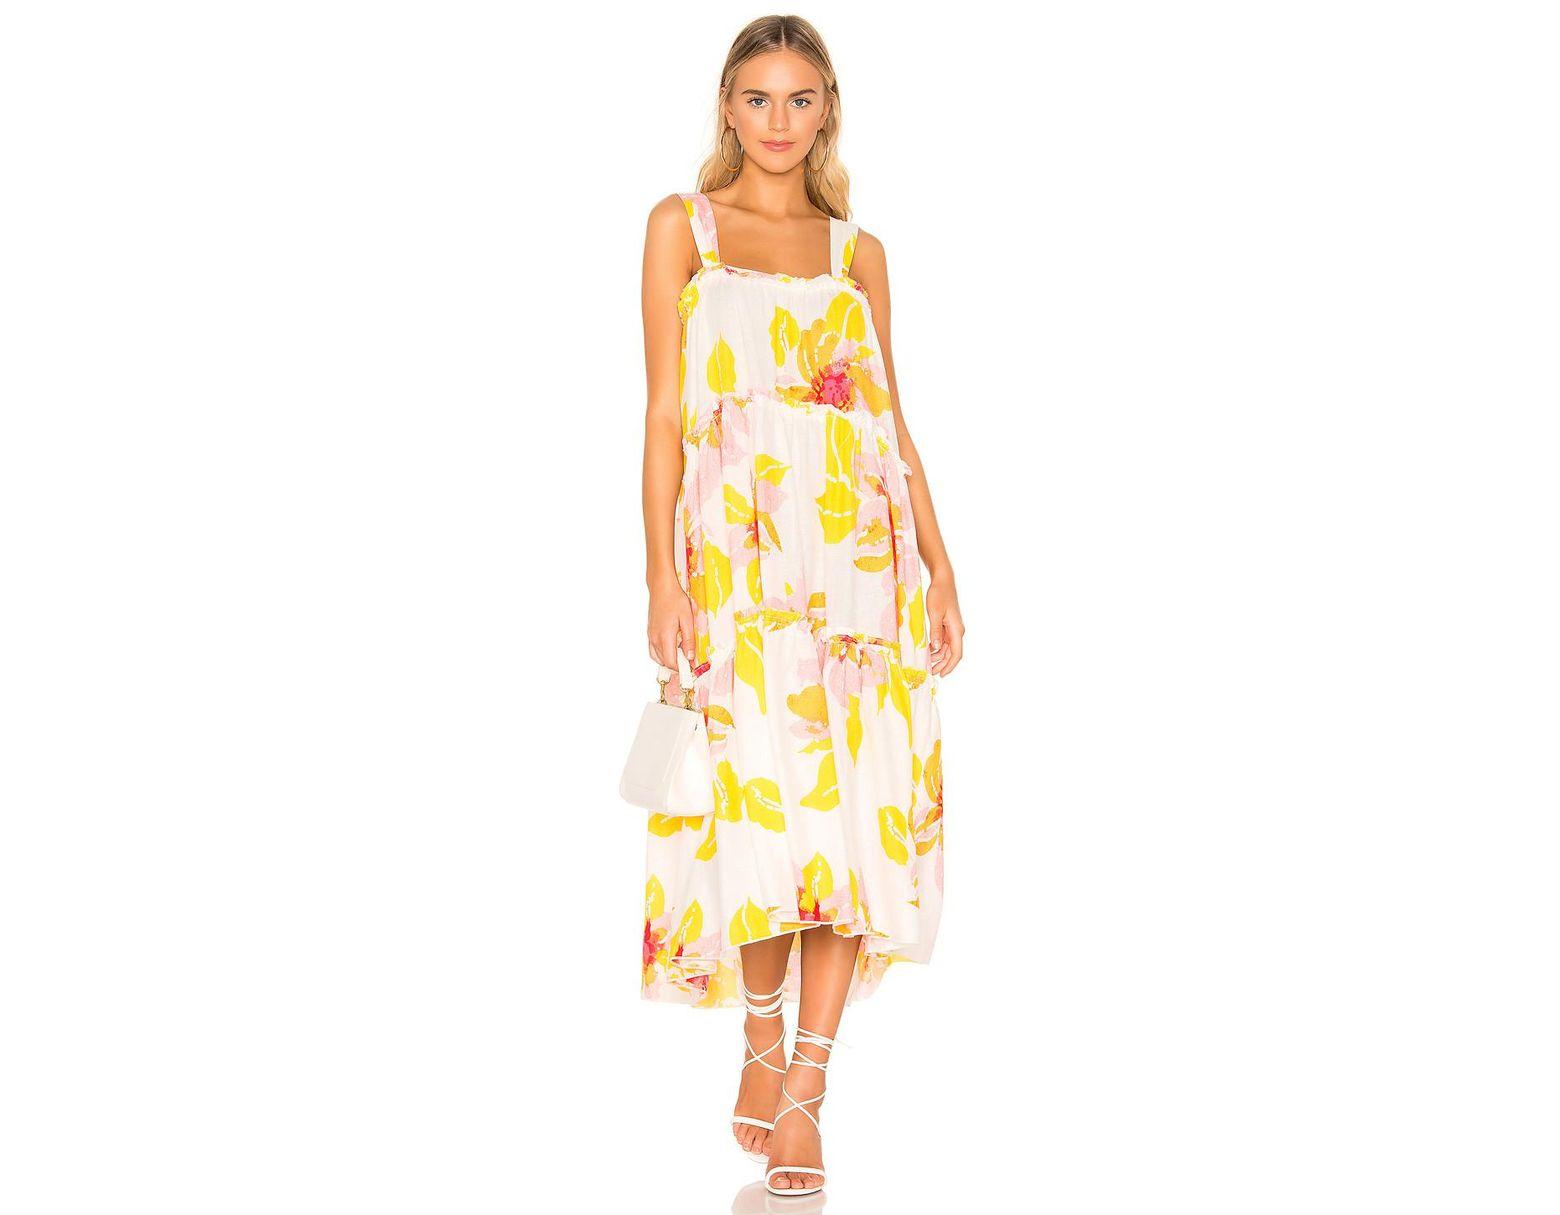 75029cbbefa1 Free People Moonshine Midi Dress in Yellow - Lyst